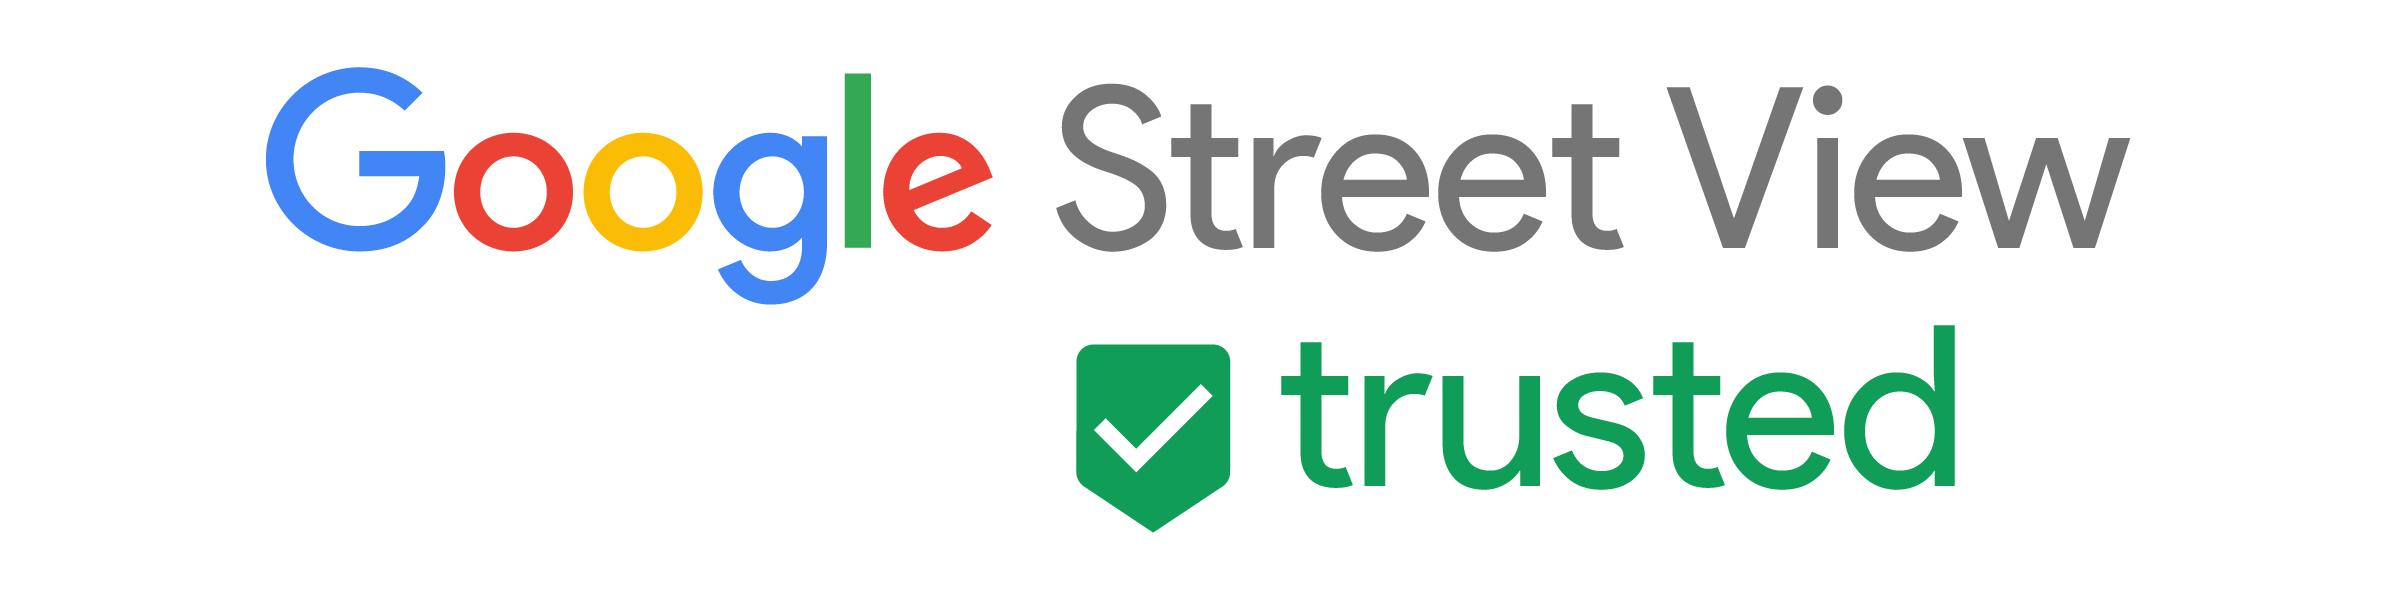 изглед Google улица доверен